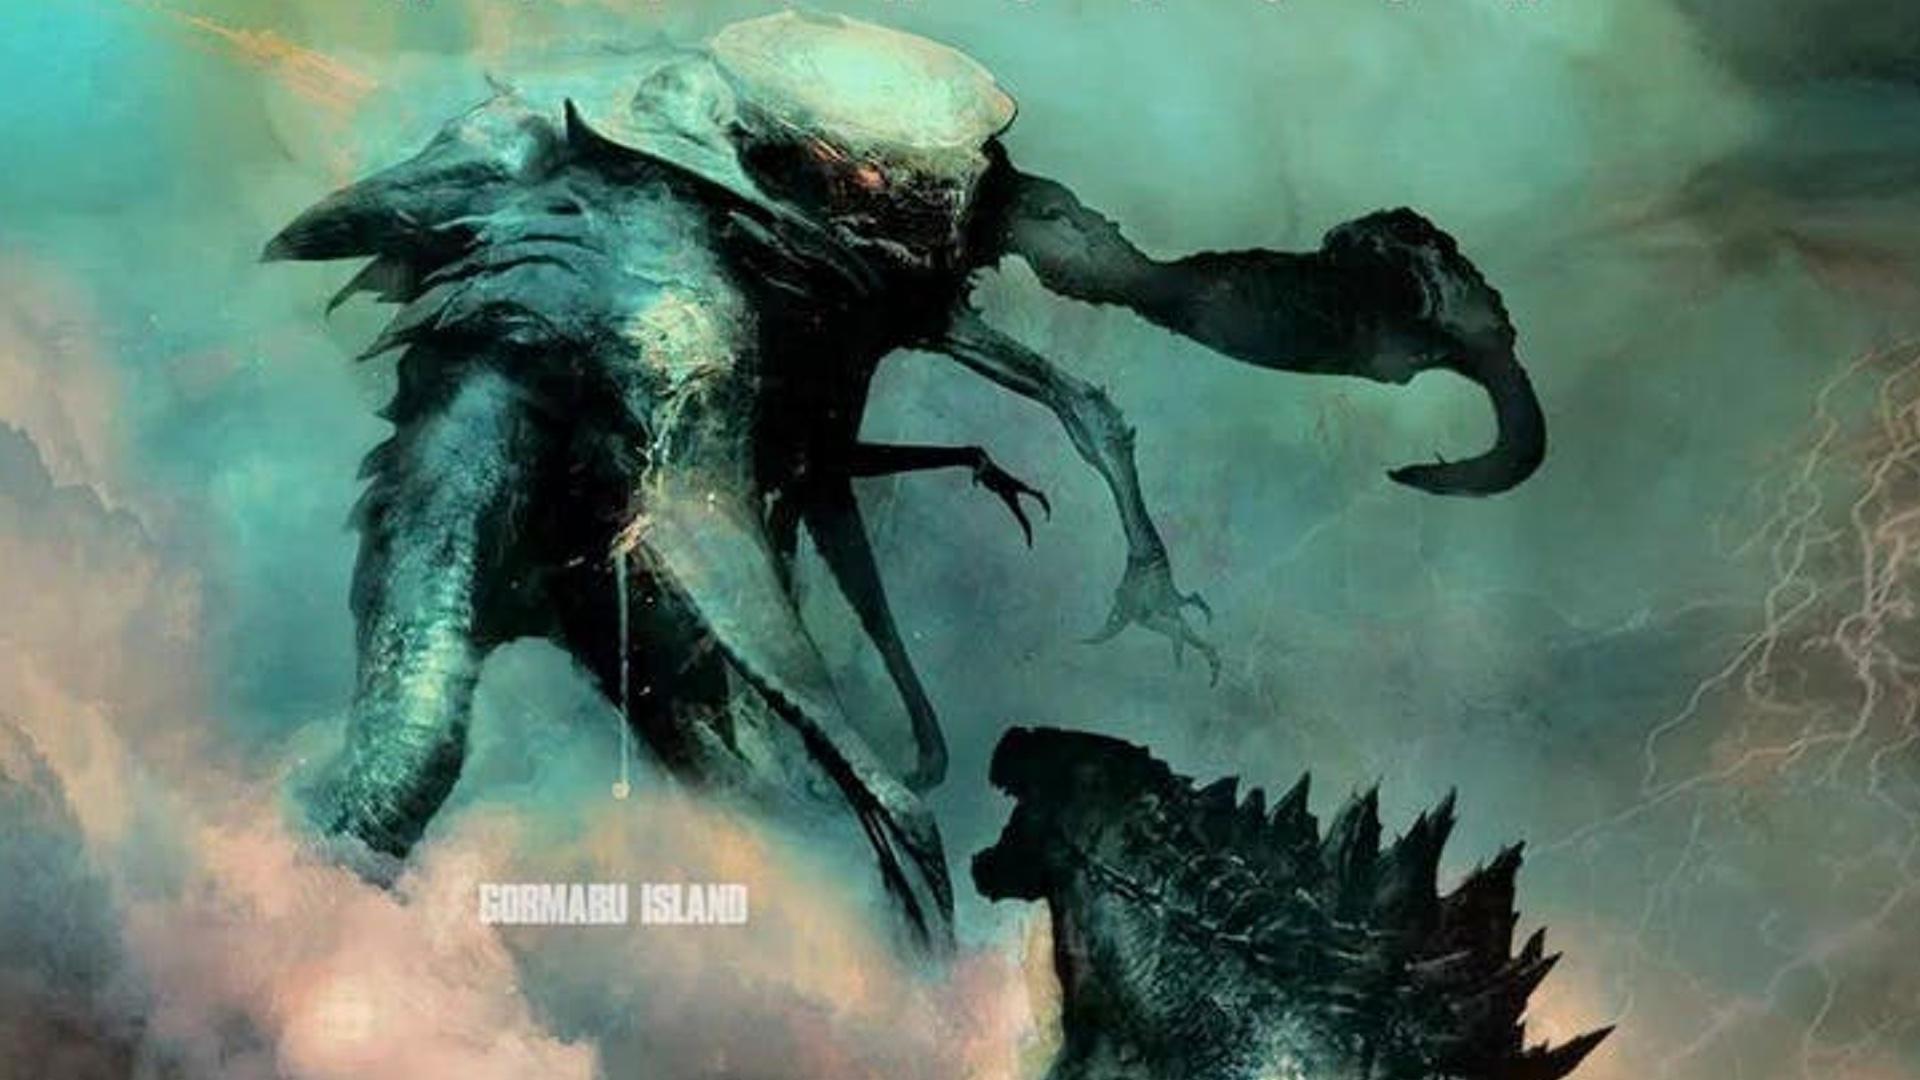 godzilla-battles-a-new-titan-in-godzilla-king-of-the-monster-prequel-comic-social.jpg